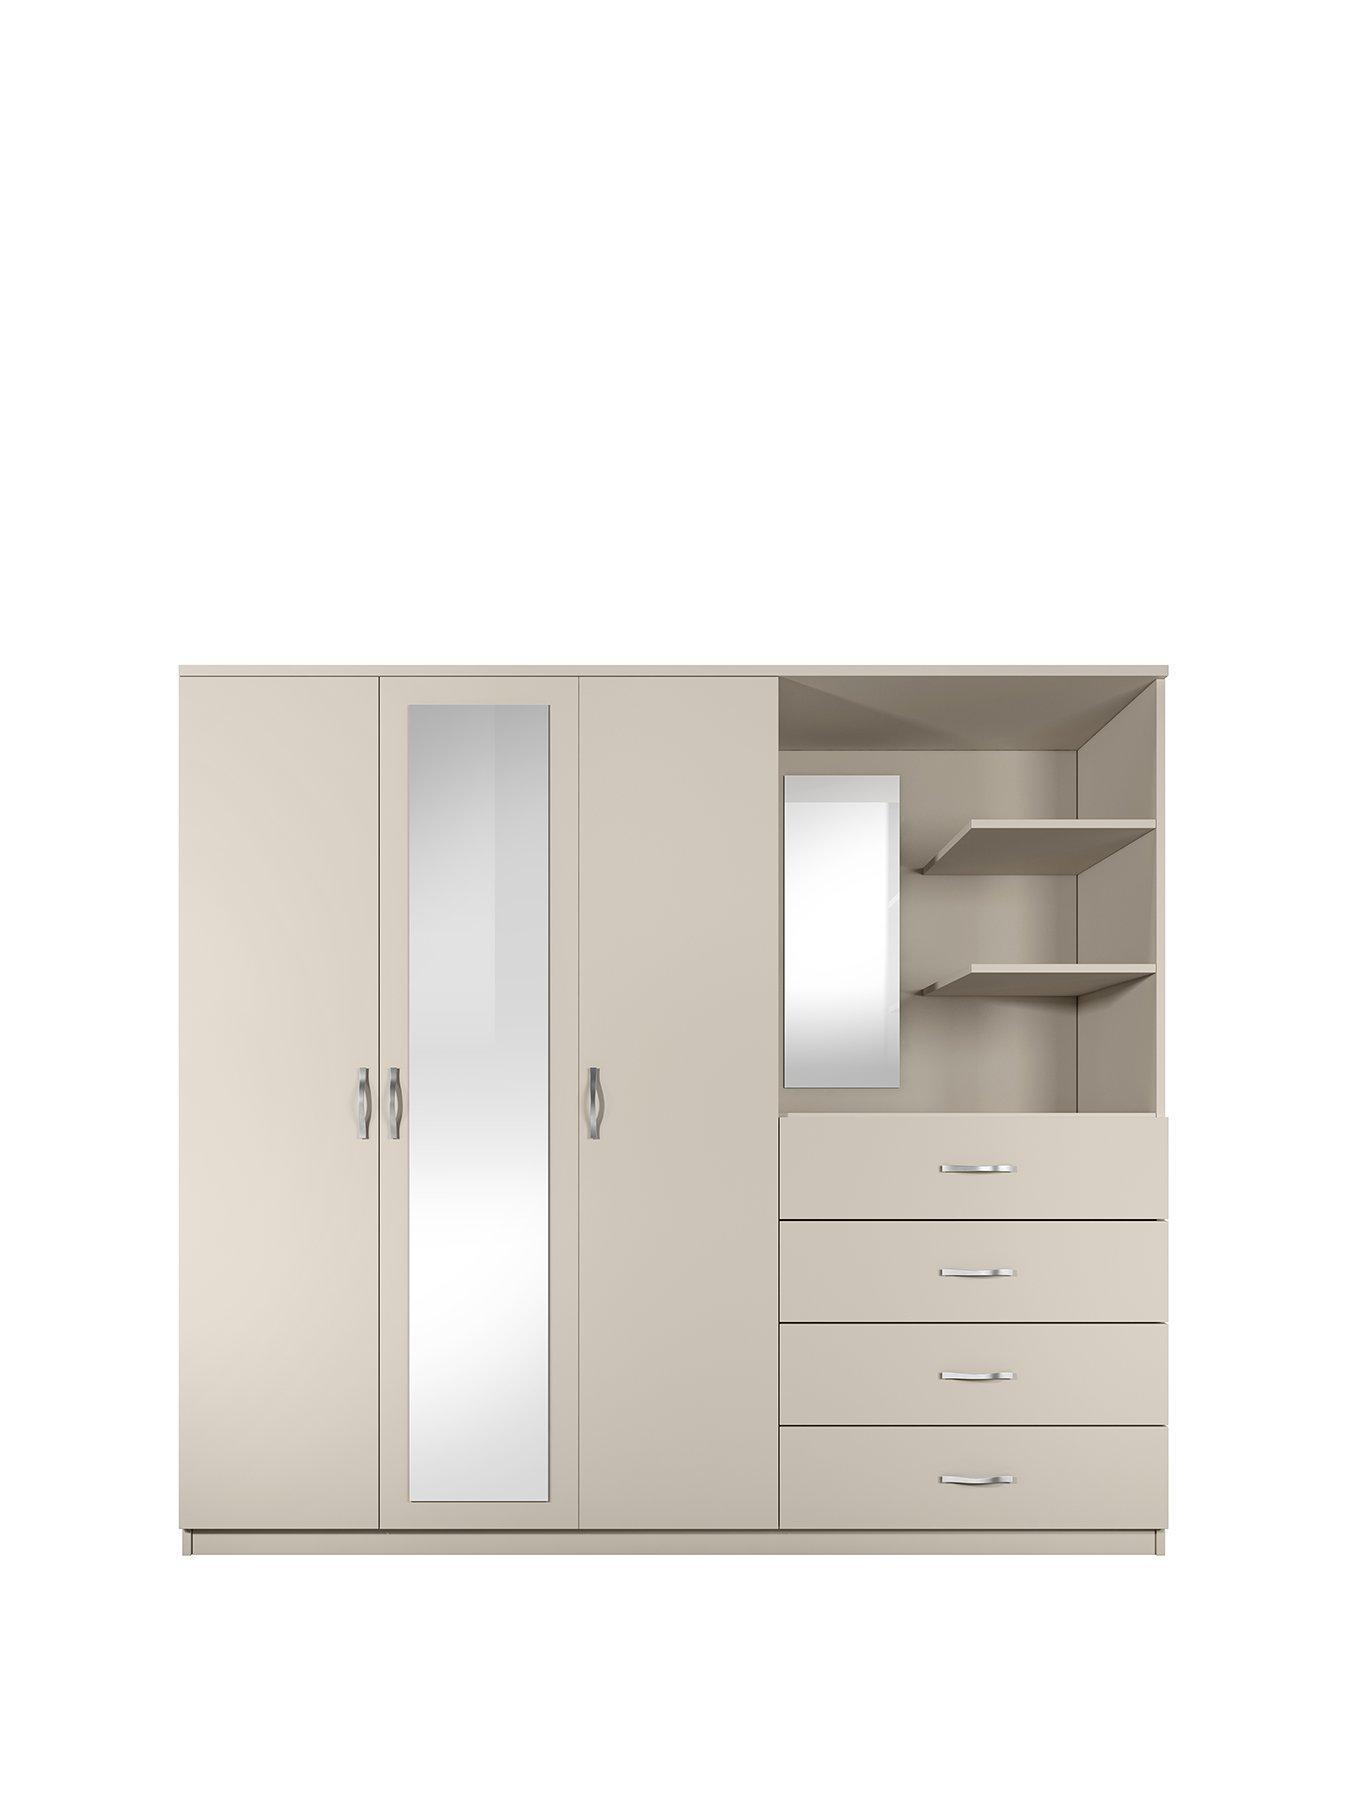 Peru 3 Door, 4 Drawer Mirrored Combi Wardrobe